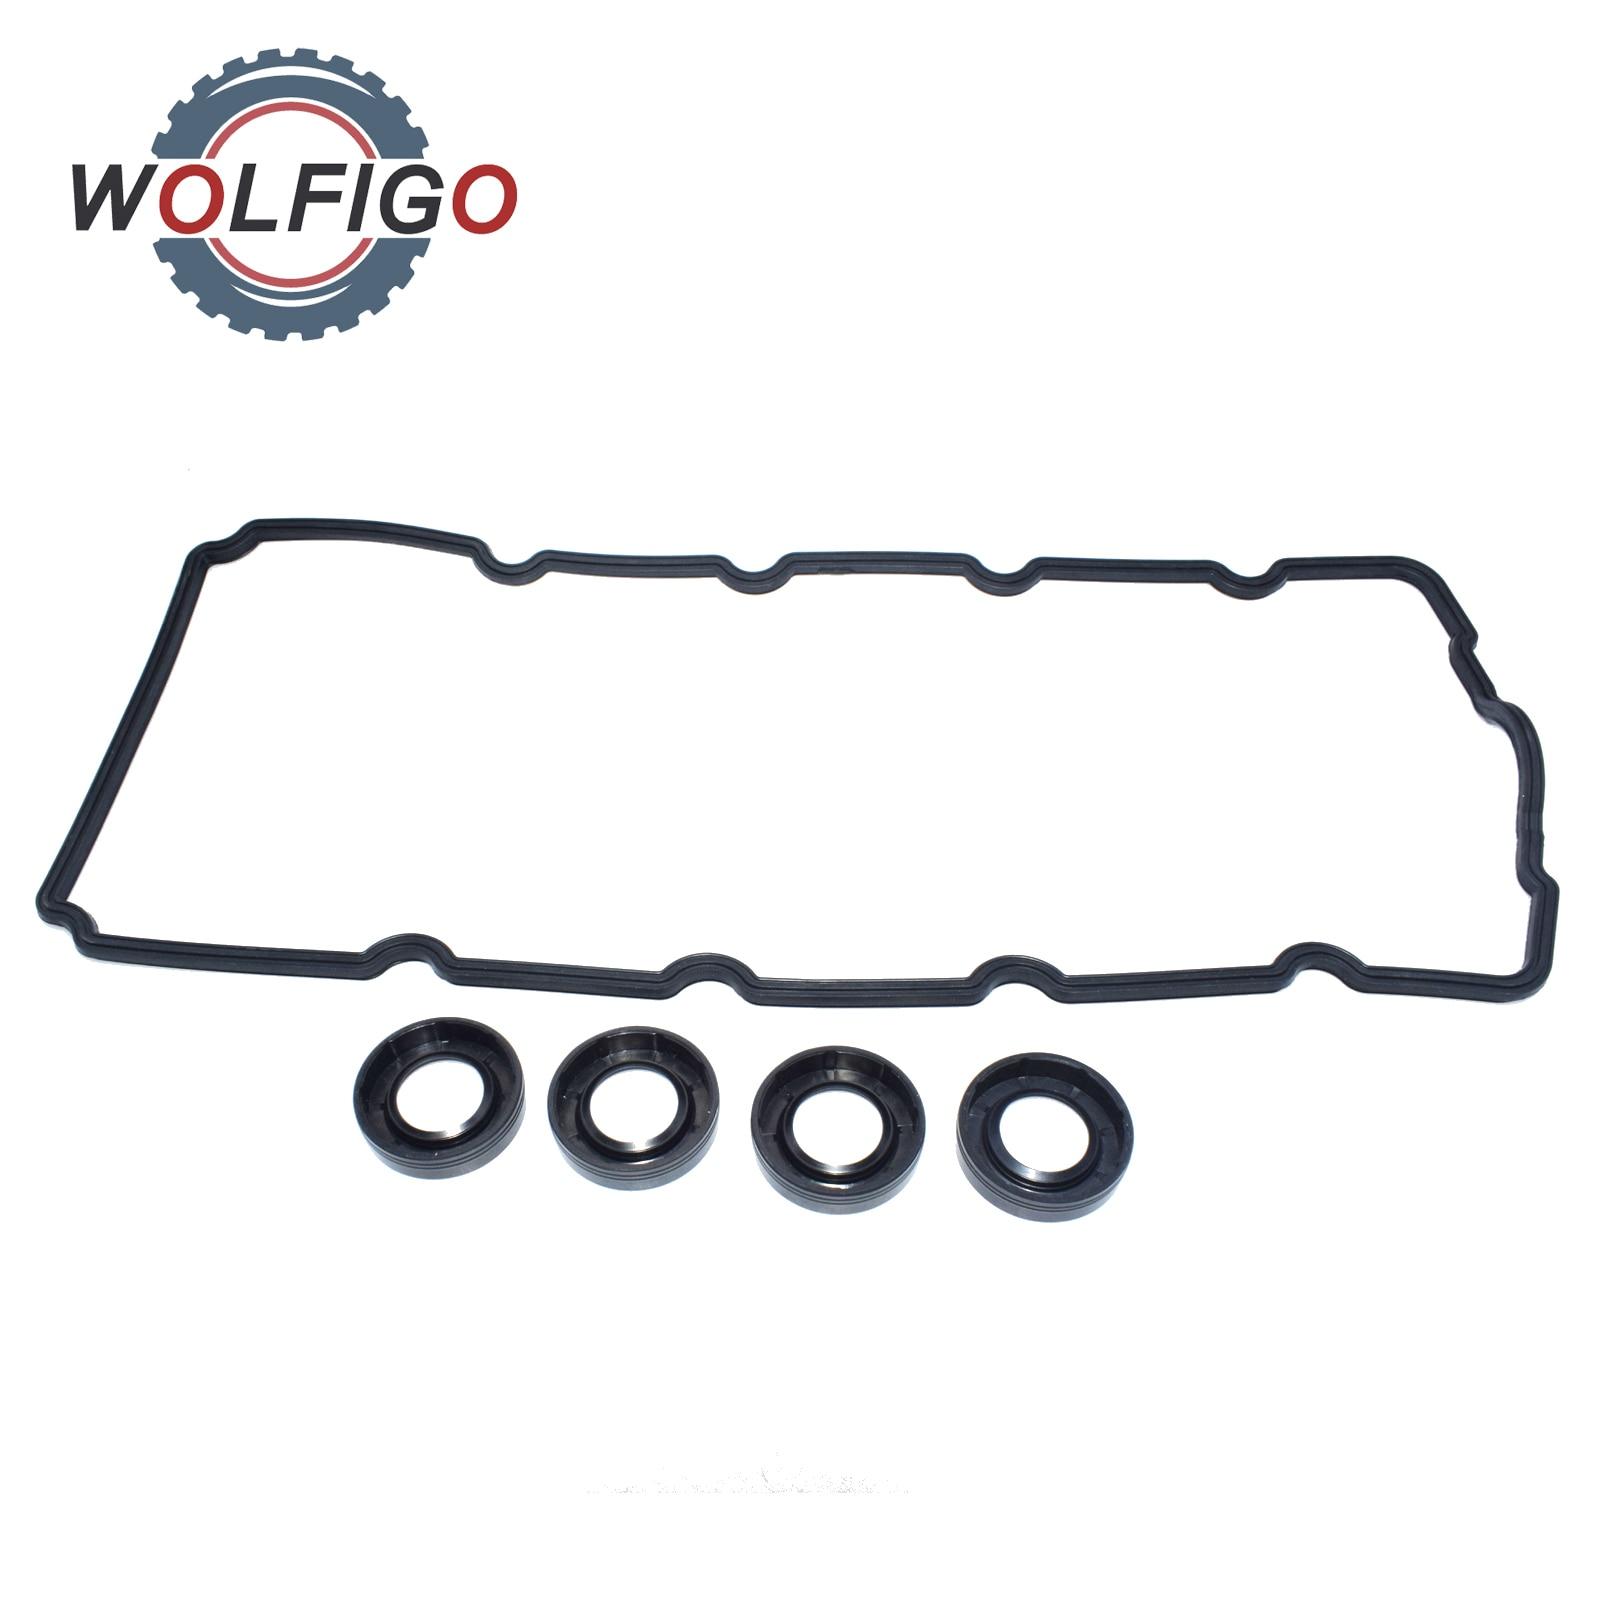 MINI Genuine Profile Cylinder Head Valve Cover Gasket R50 R52 R53 11121485838